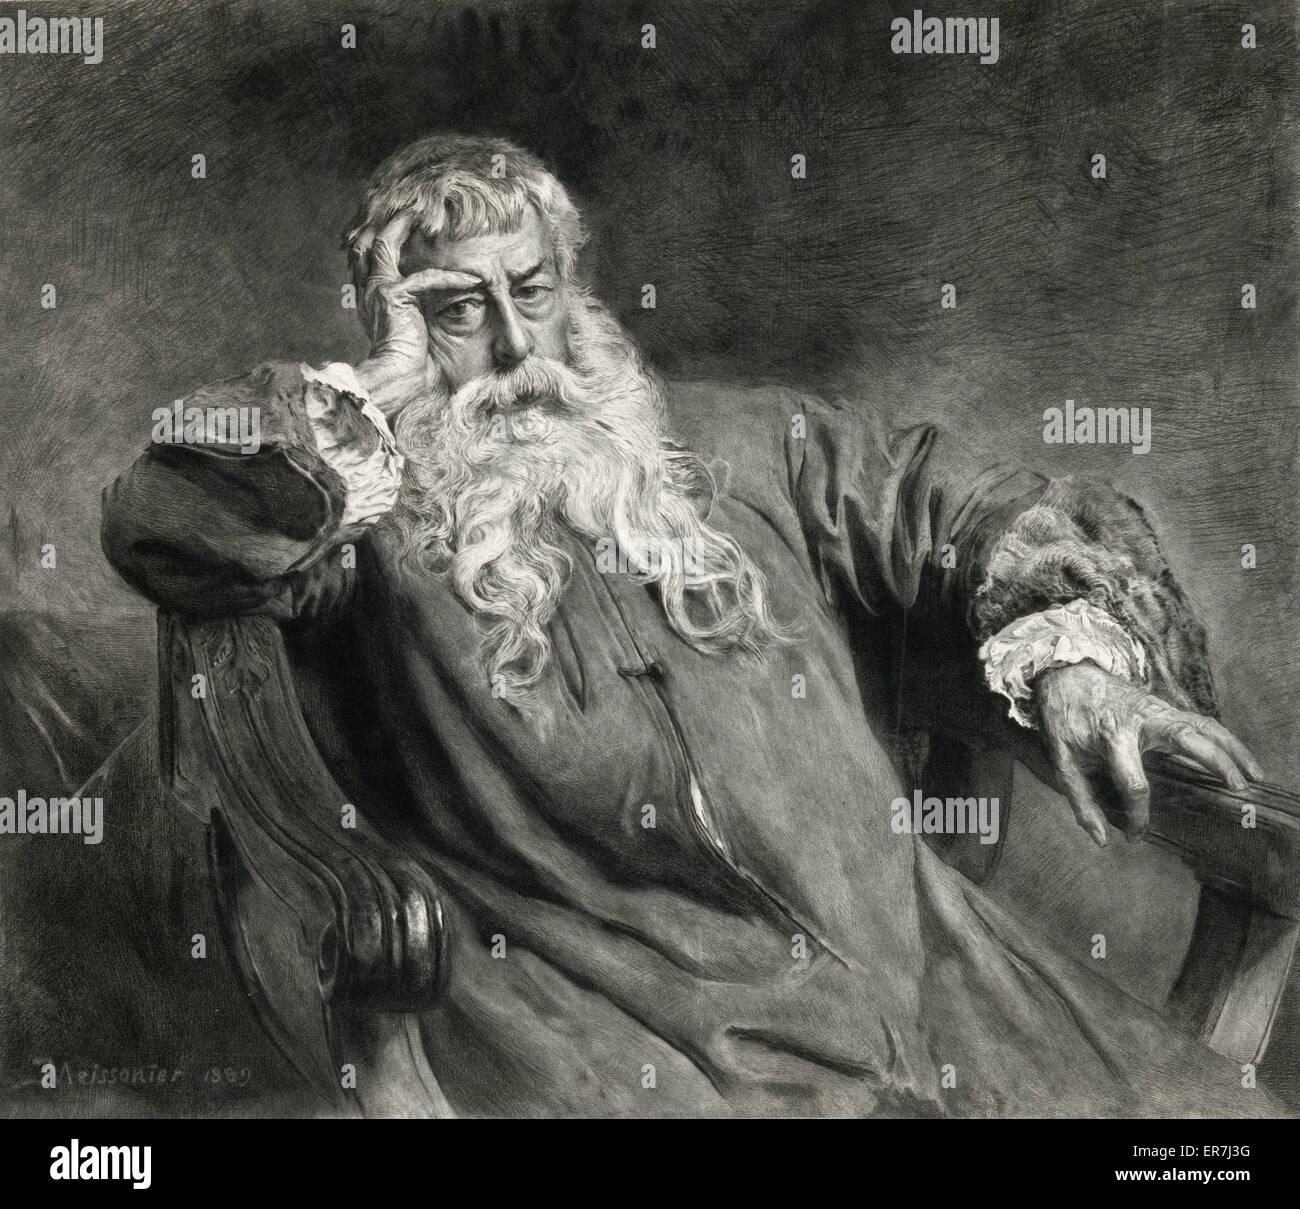 Self-Portrait of J.L.E. Meissonier. Date c1894 Nov. 20. - Stock Image